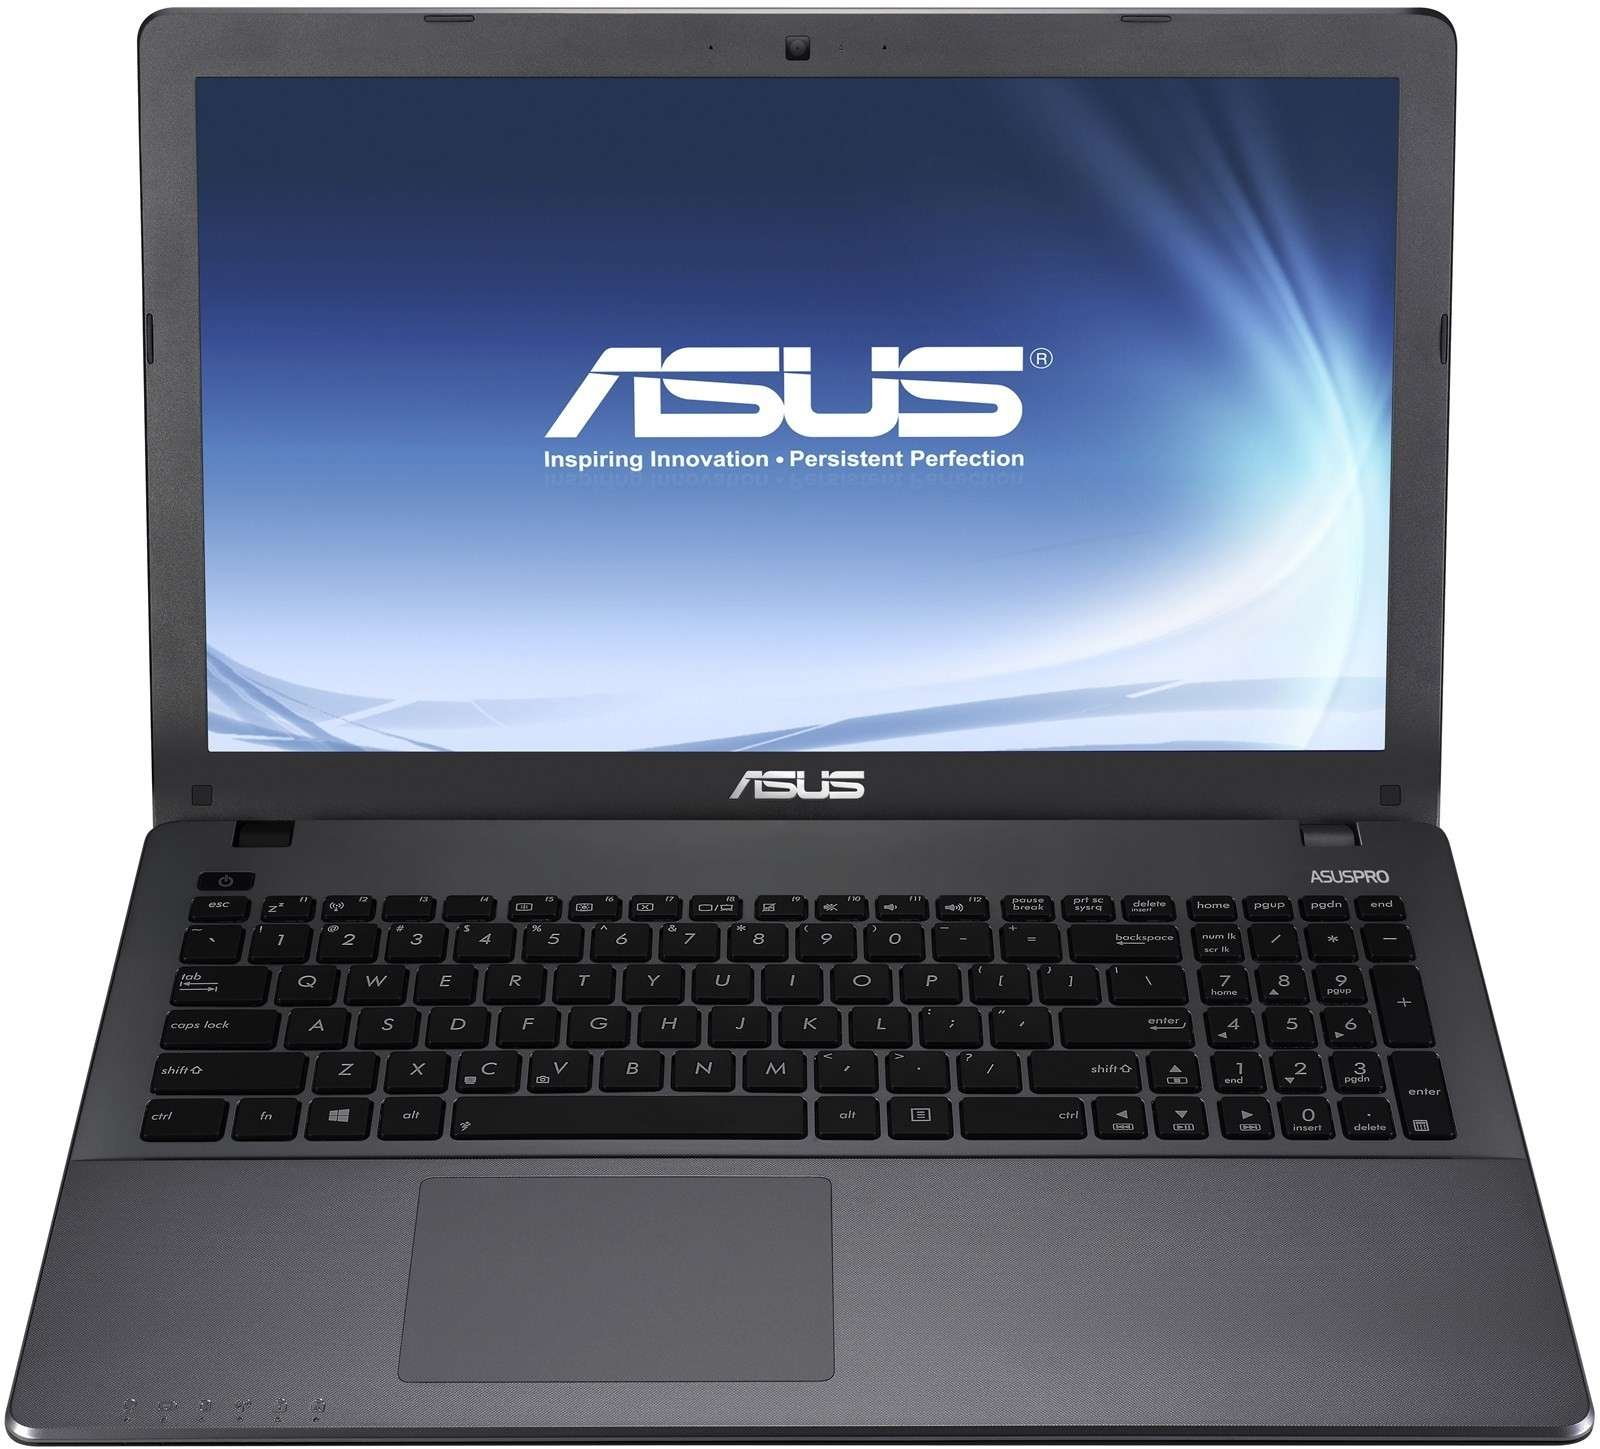 [BAN TRA GOP] Laptop ASUS Core i5 thế hệ 4 mới nhất 480_1_10